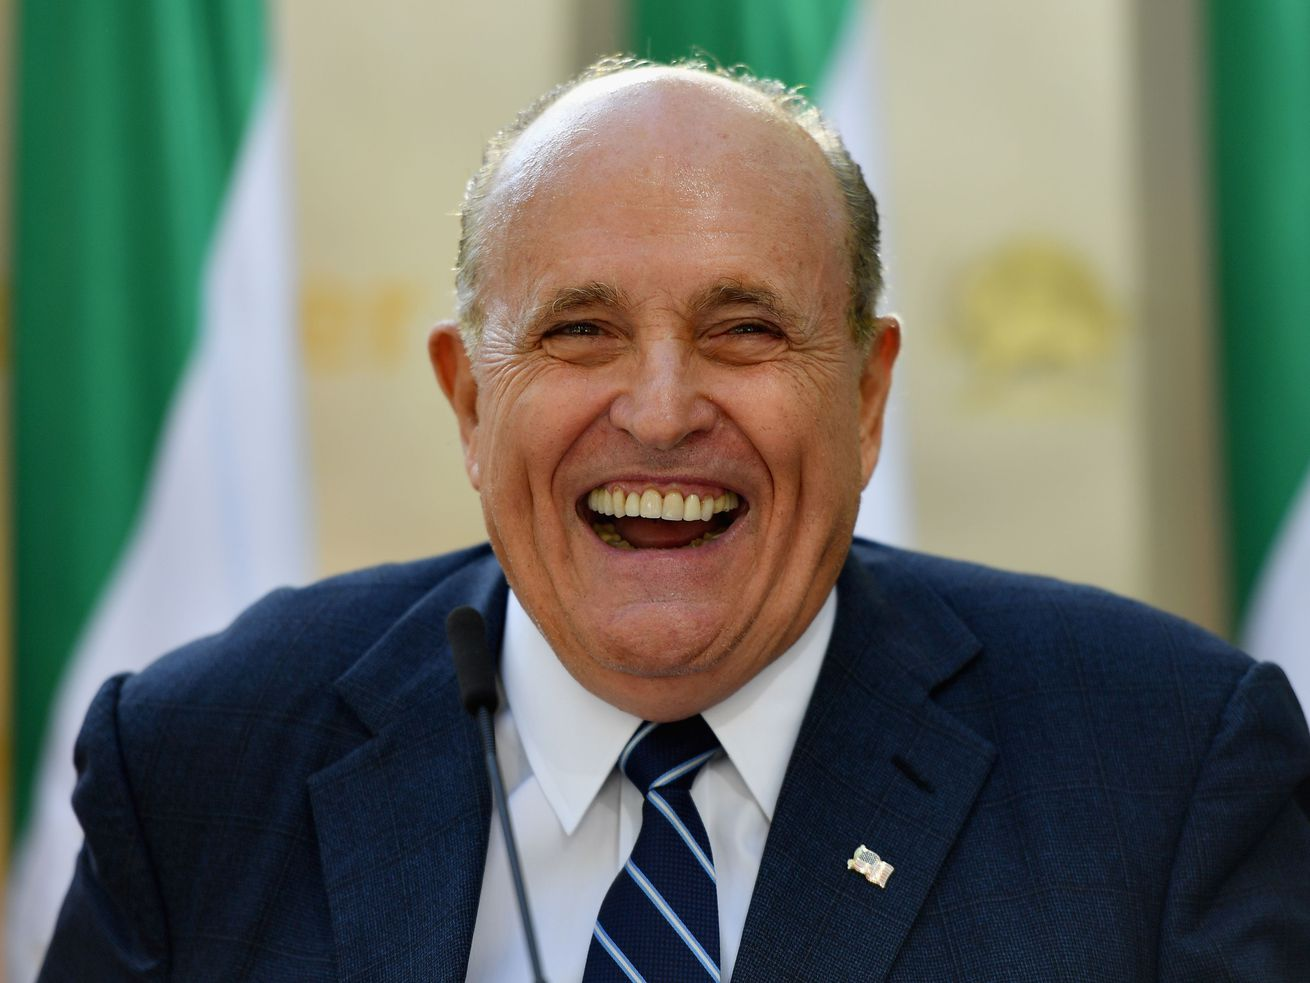 Rudy Giuliani Tried To Score Big Bucks In Ukraine As Scandal Unfolded Pnu